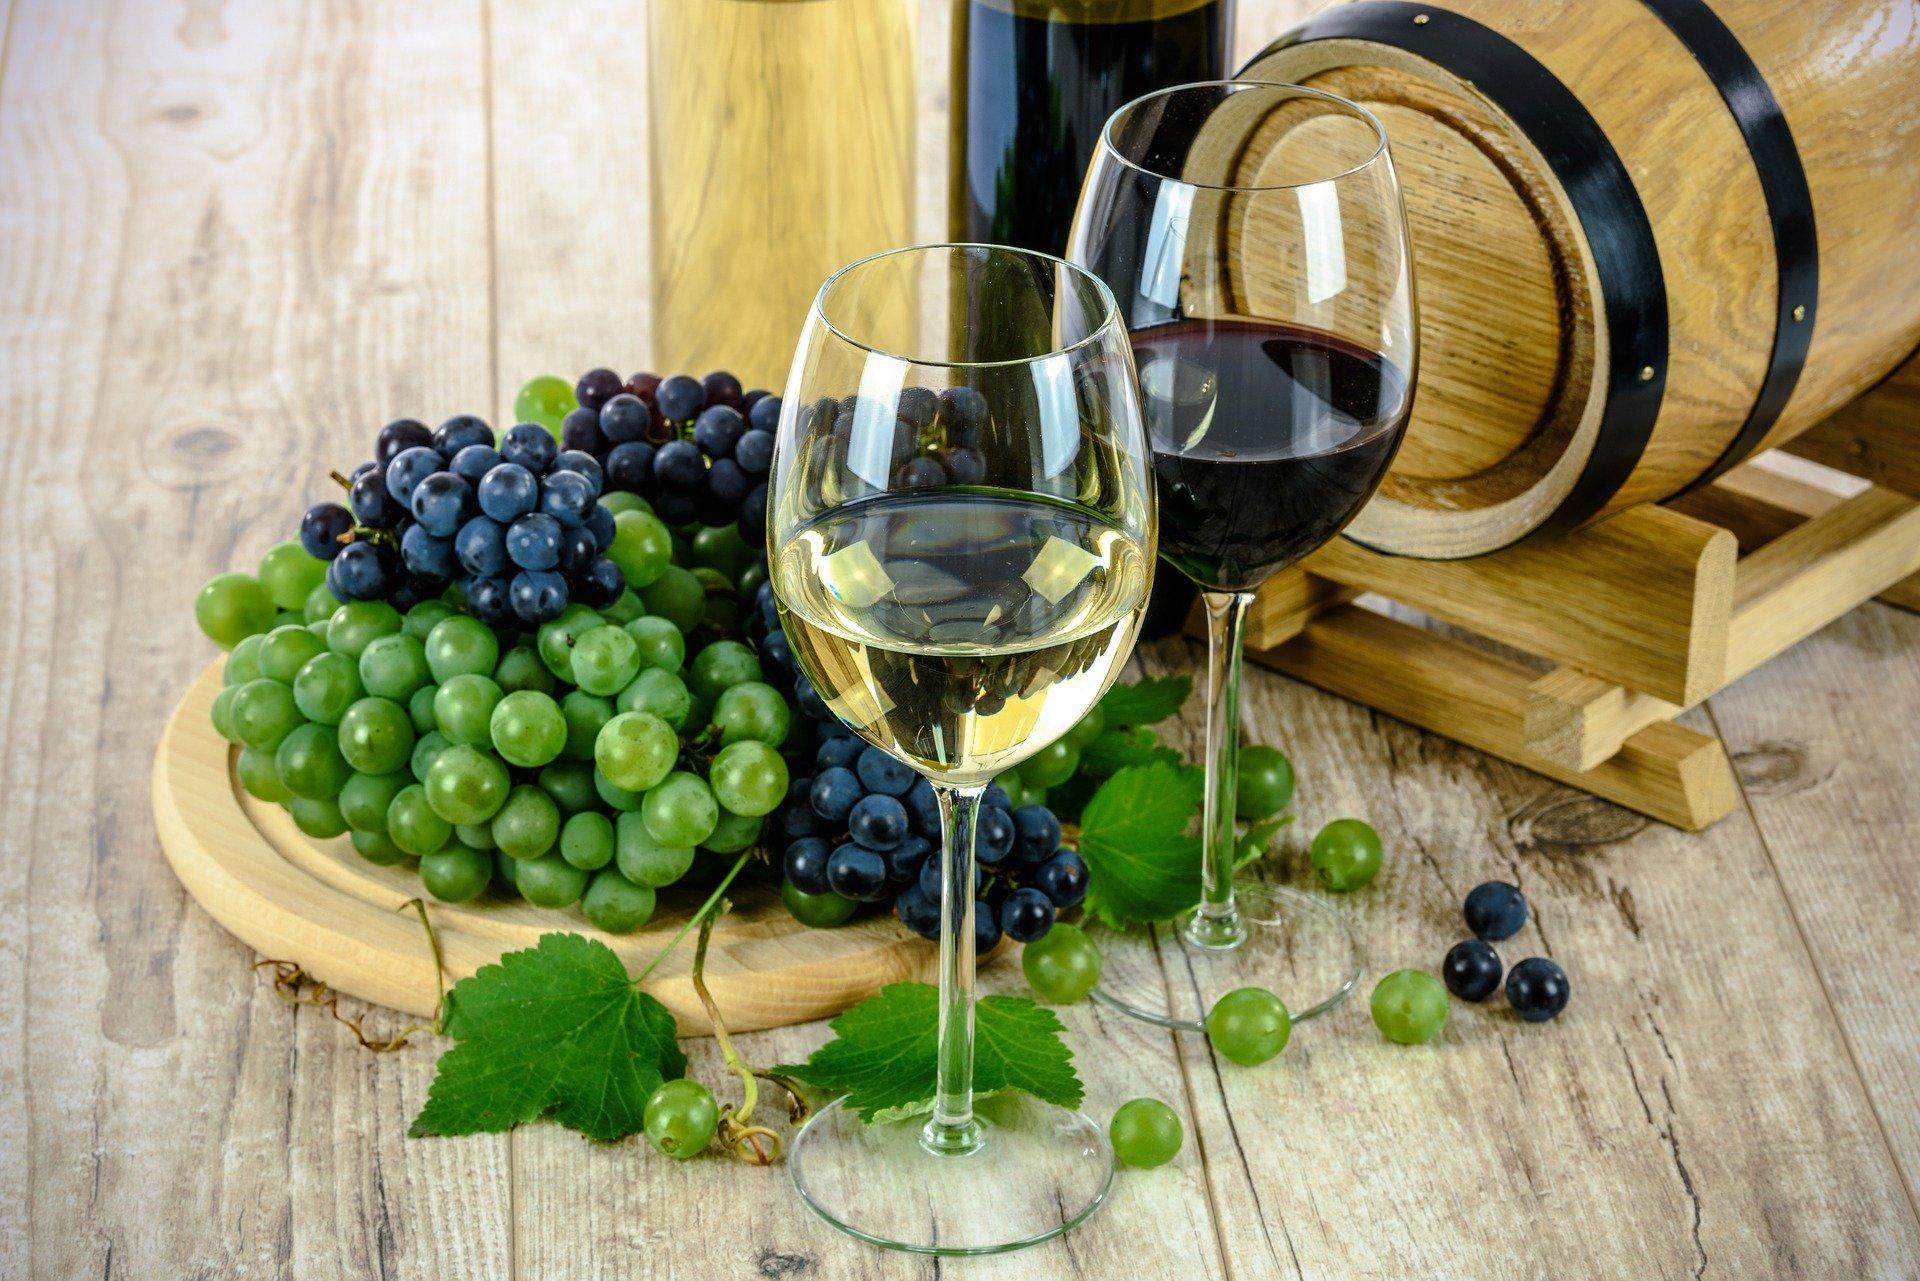 Recipes Using Wine